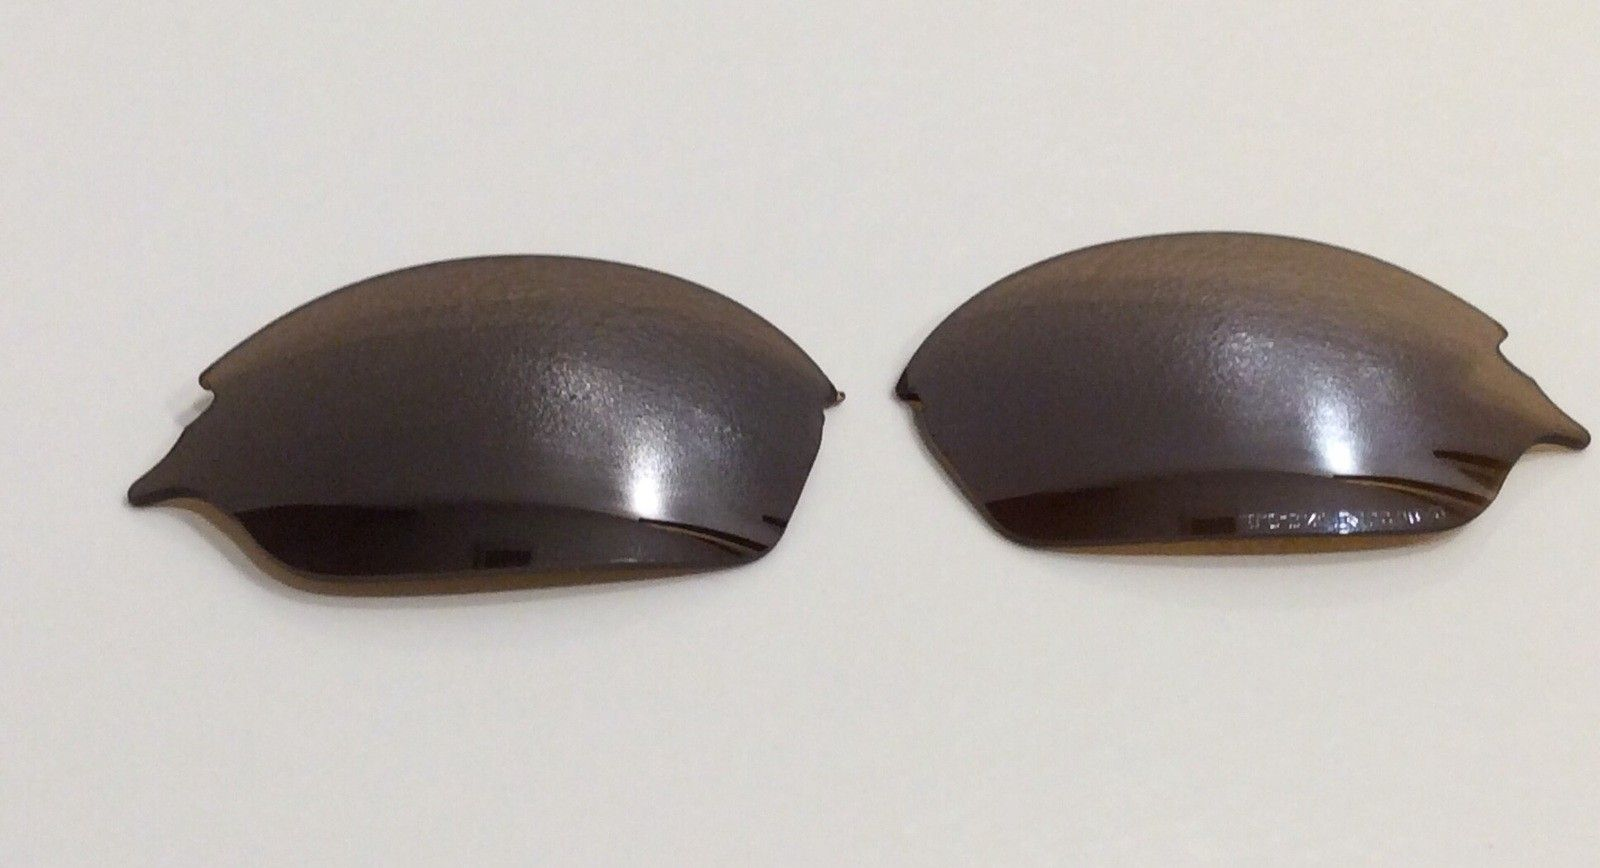 New Romeo 2 Titanium Lenses $100 shipped - image.jpg